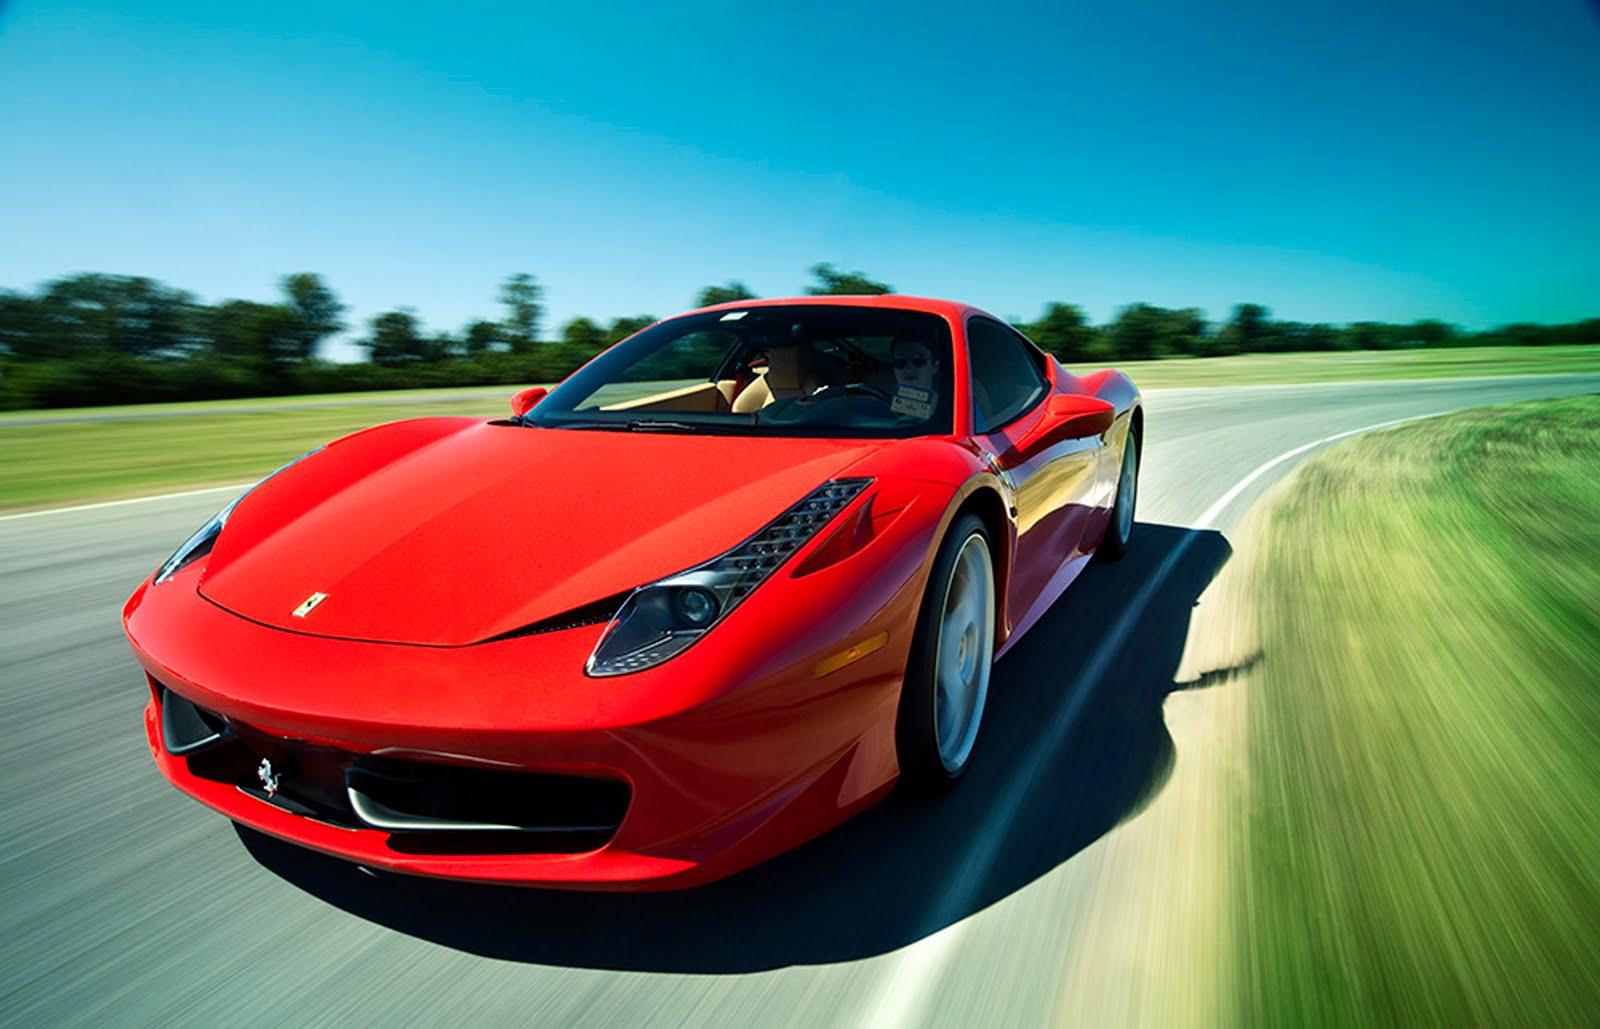 CARS WALLPAPERS DESKTOP HD | Top HD Wallpapers